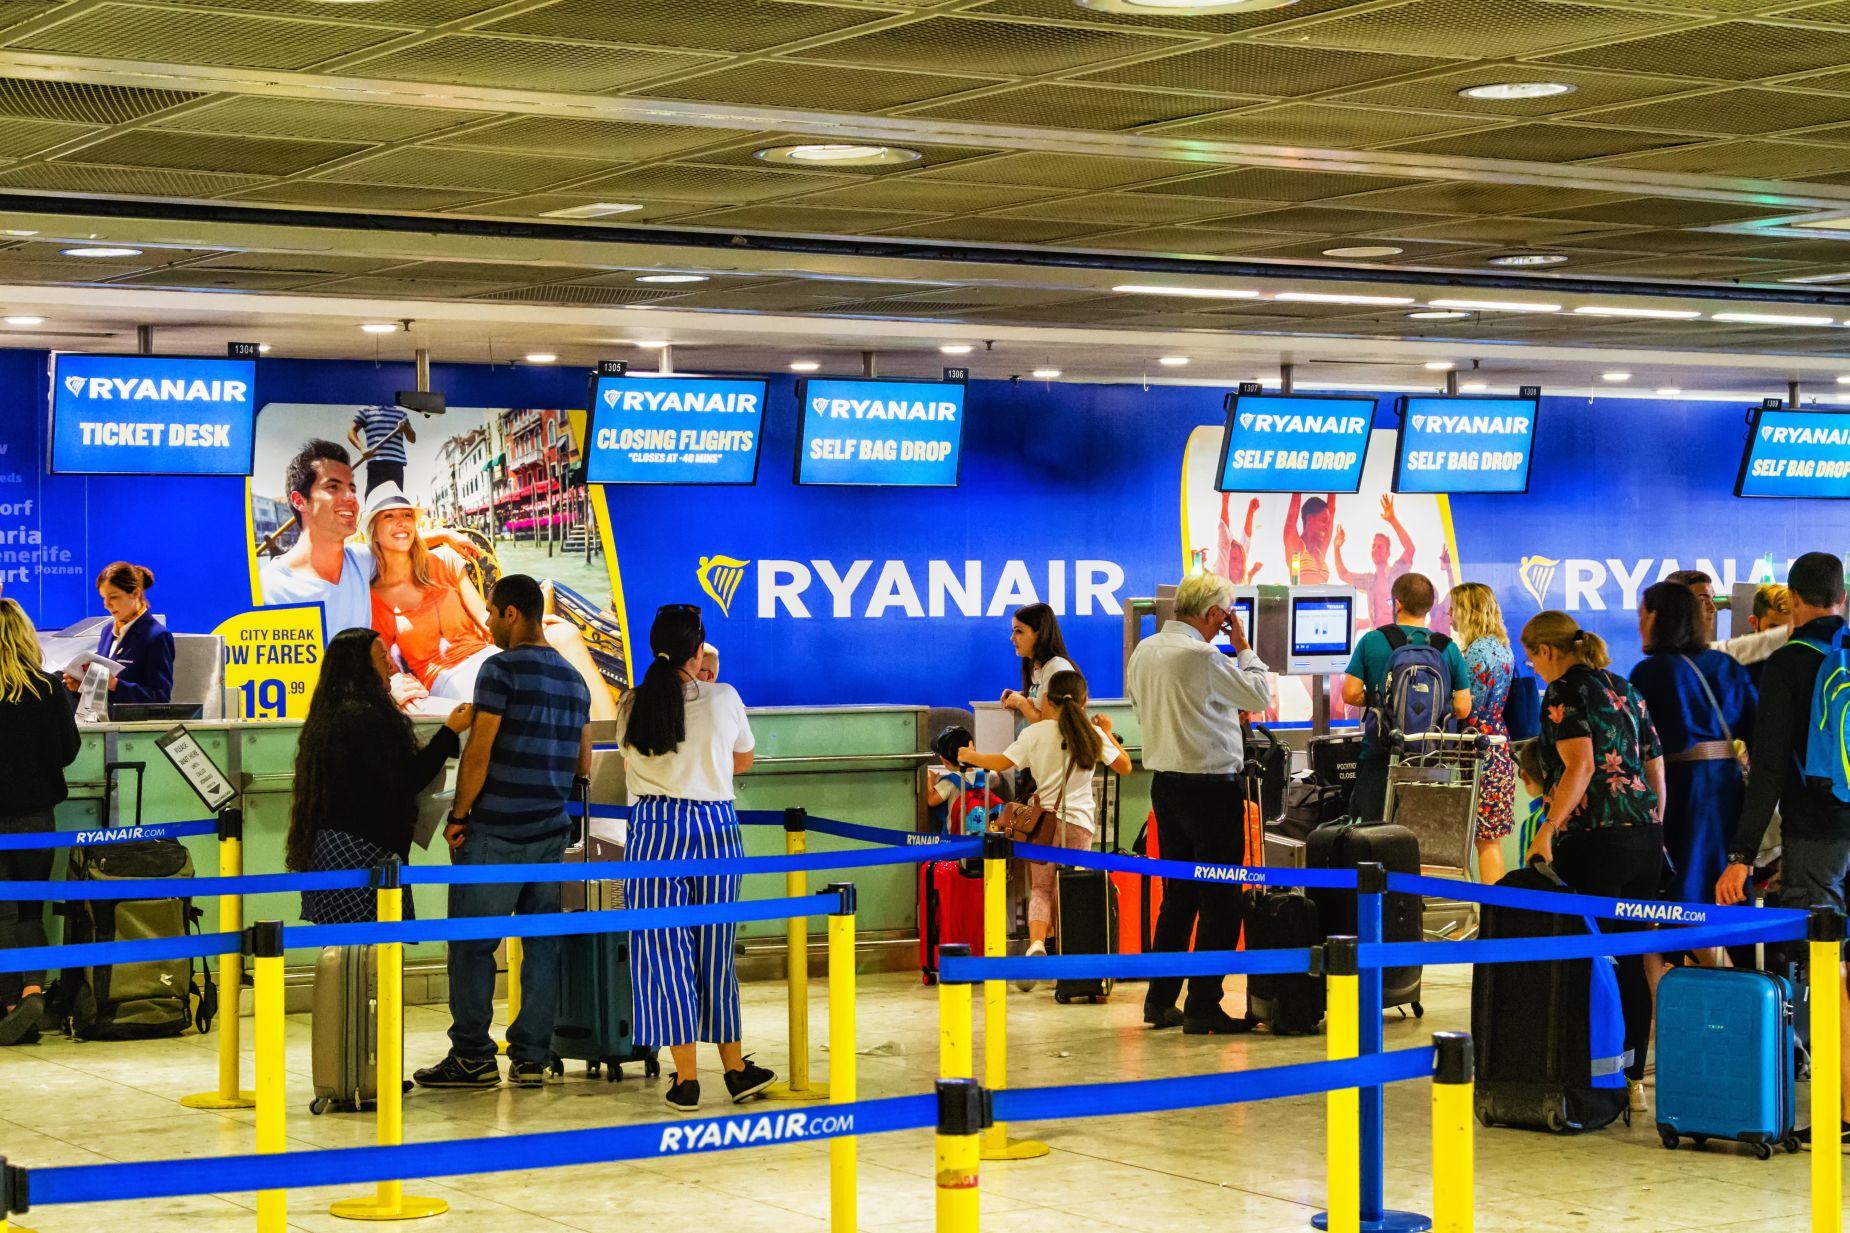 Bagaż w Ryanair